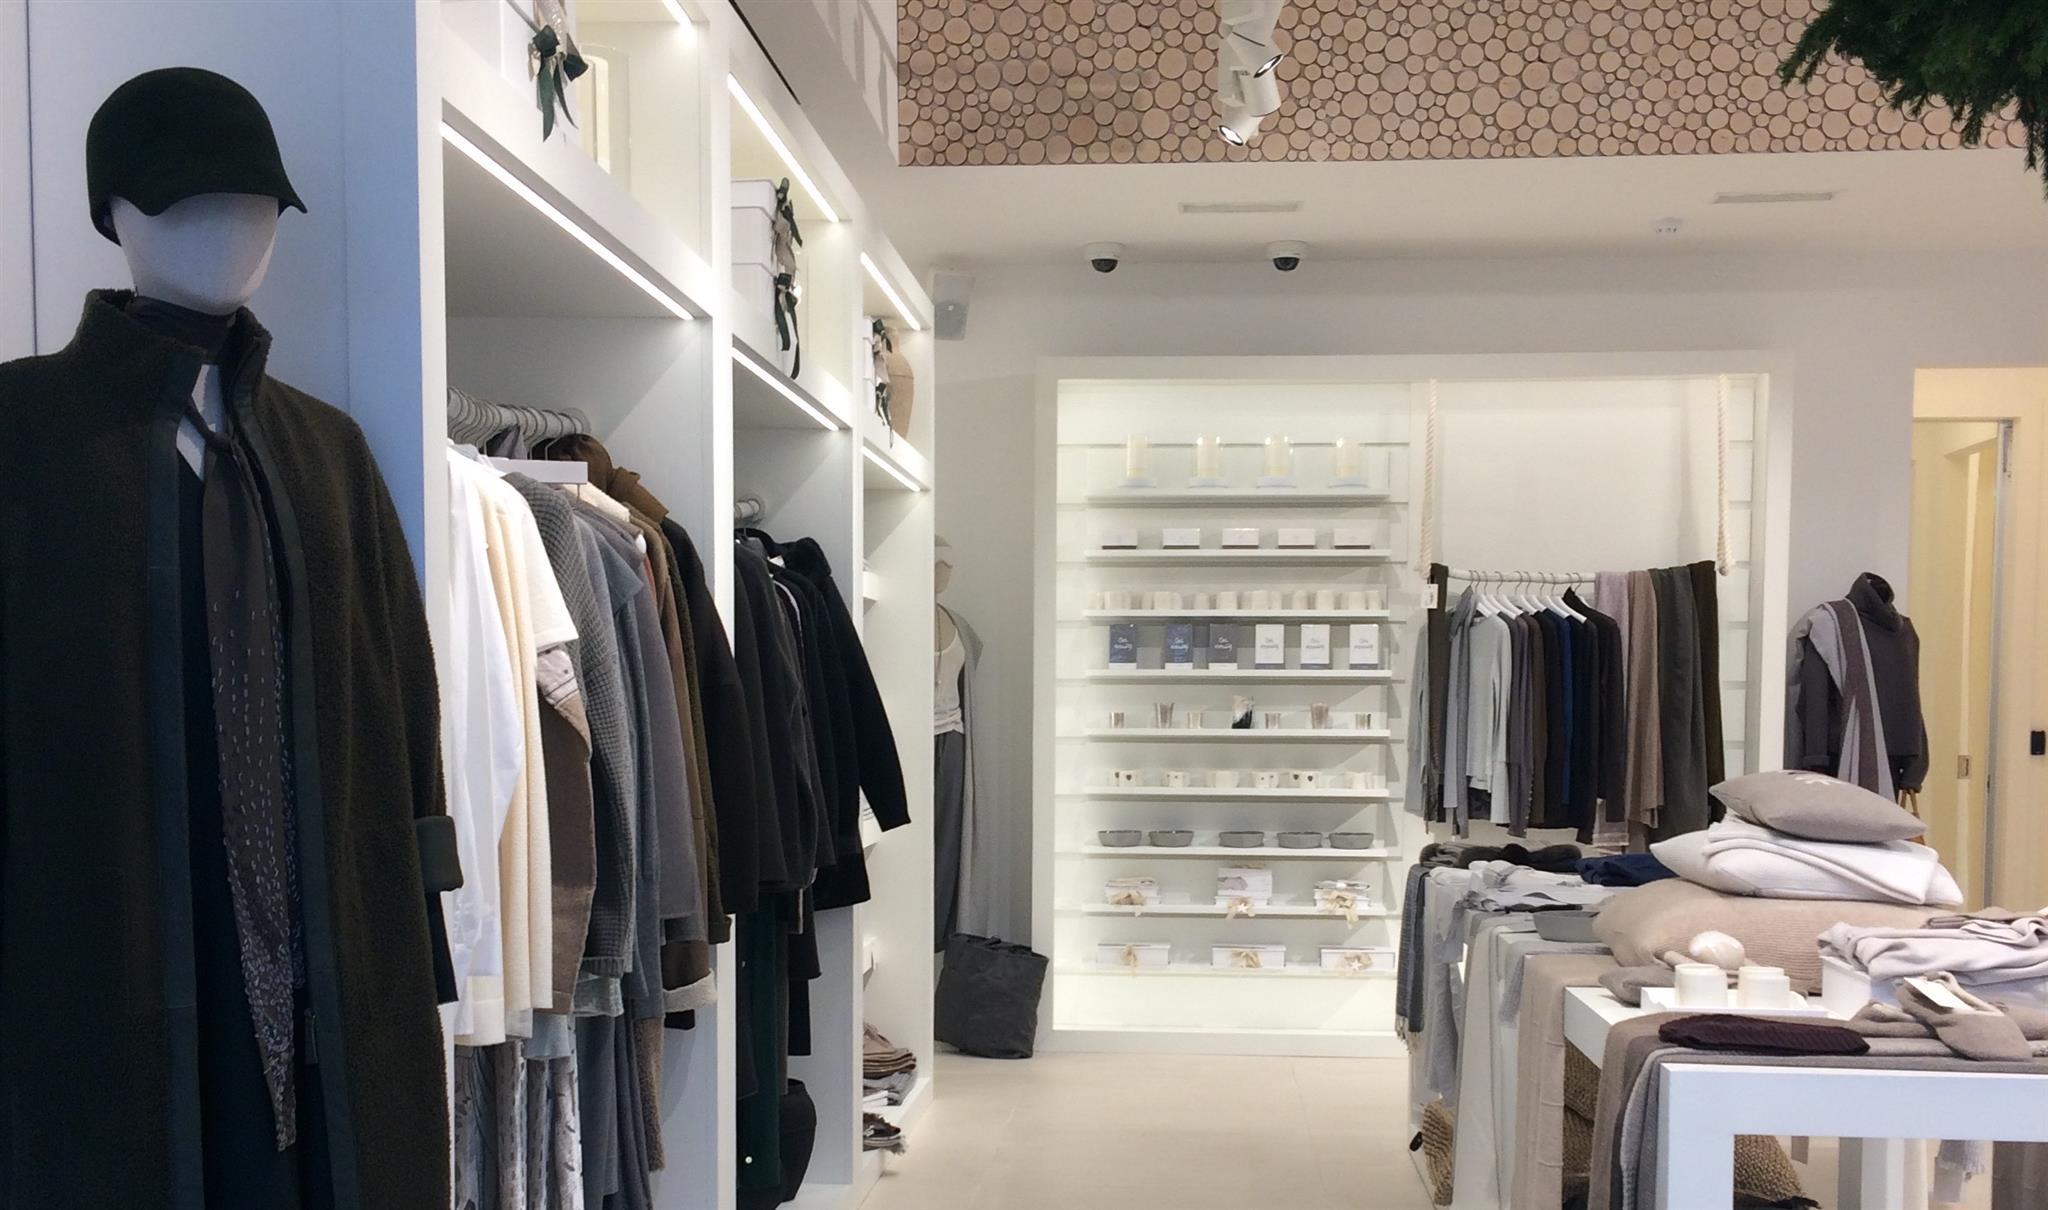 retail fashion gig economy